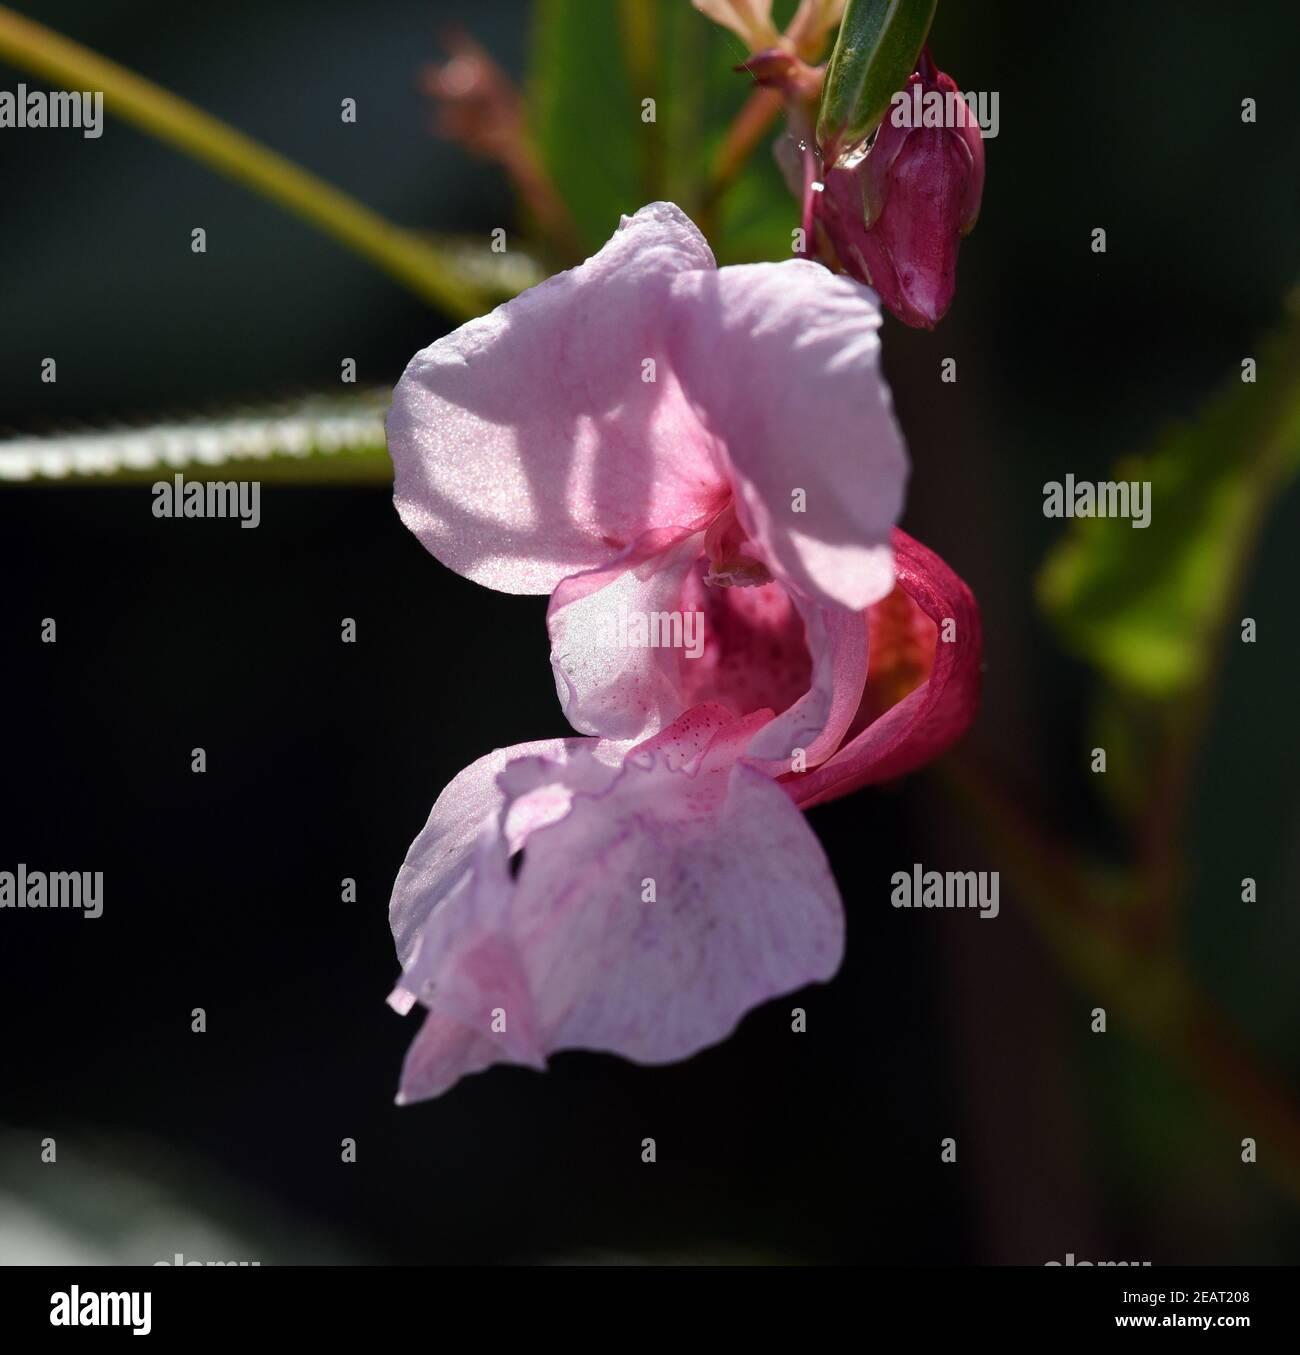 Druesiges Springkraut, Impatiens, glandulifera, Holly, Bachbluete Stock Photo